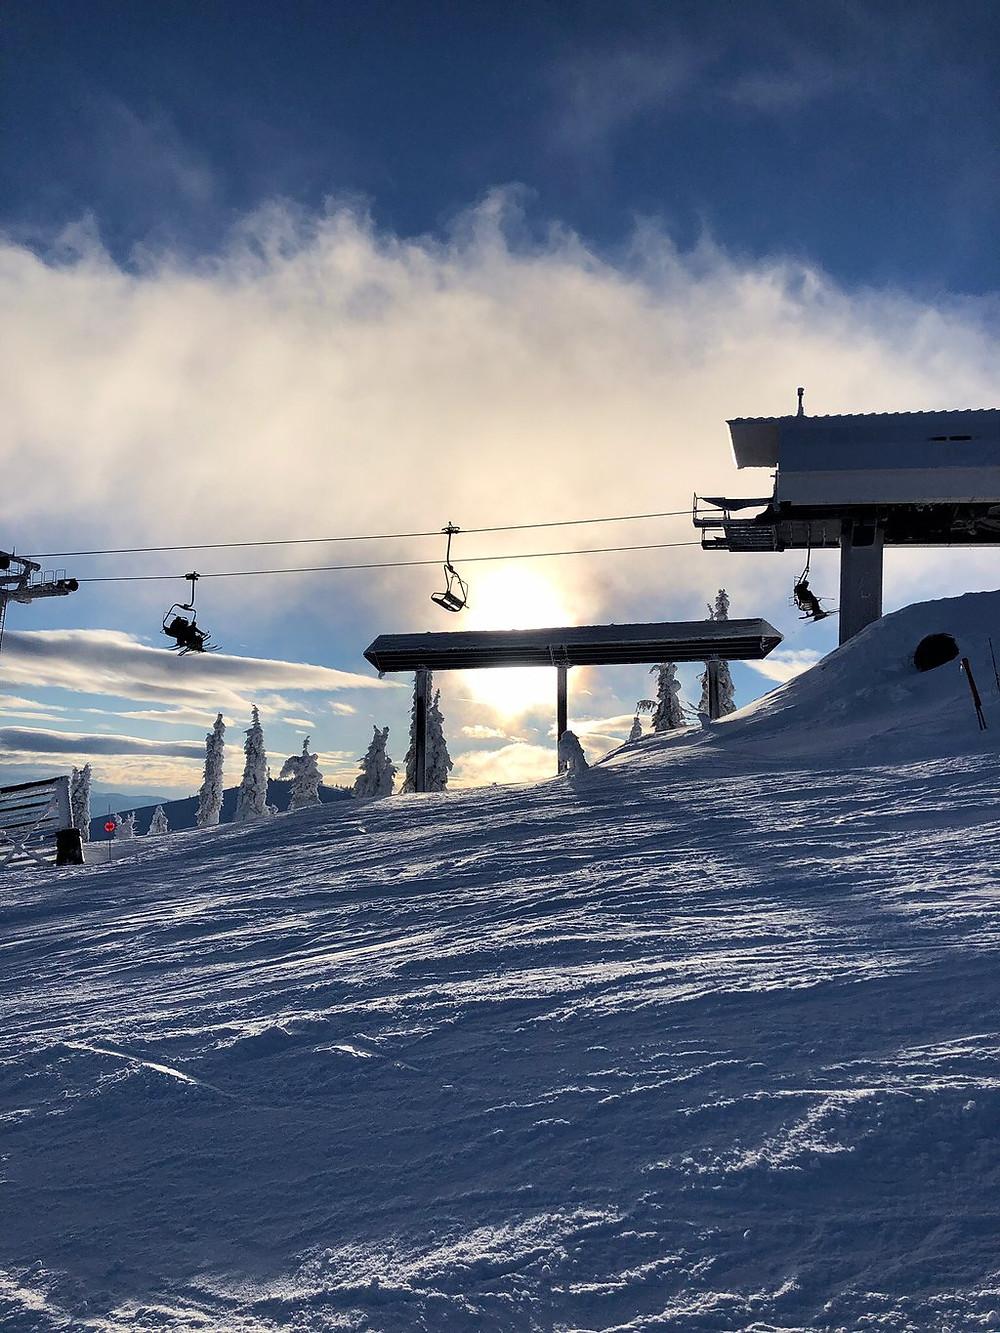 Schweitzer Ski Lift Vacation Spokane Coeur d'Alene Sandpoint Trip Road